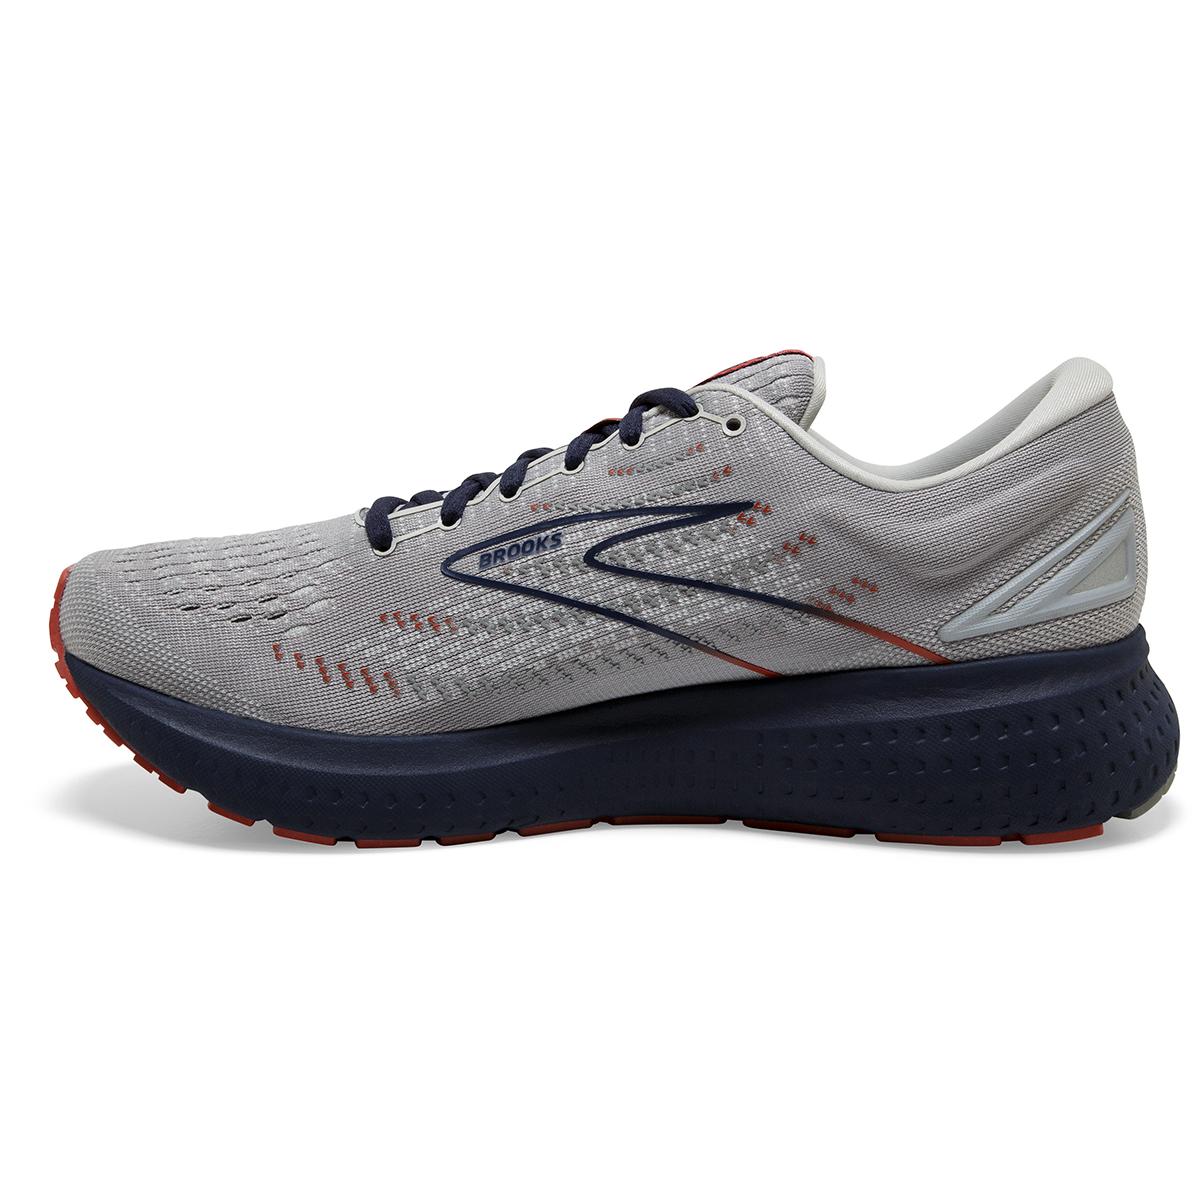 Men's Brooks Glycerin 19 Running Shoe - Color: Grey/Alloy/Peacoat - Size: 7 - Width: Regular, Grey/Alloy/Peacoat, large, image 3